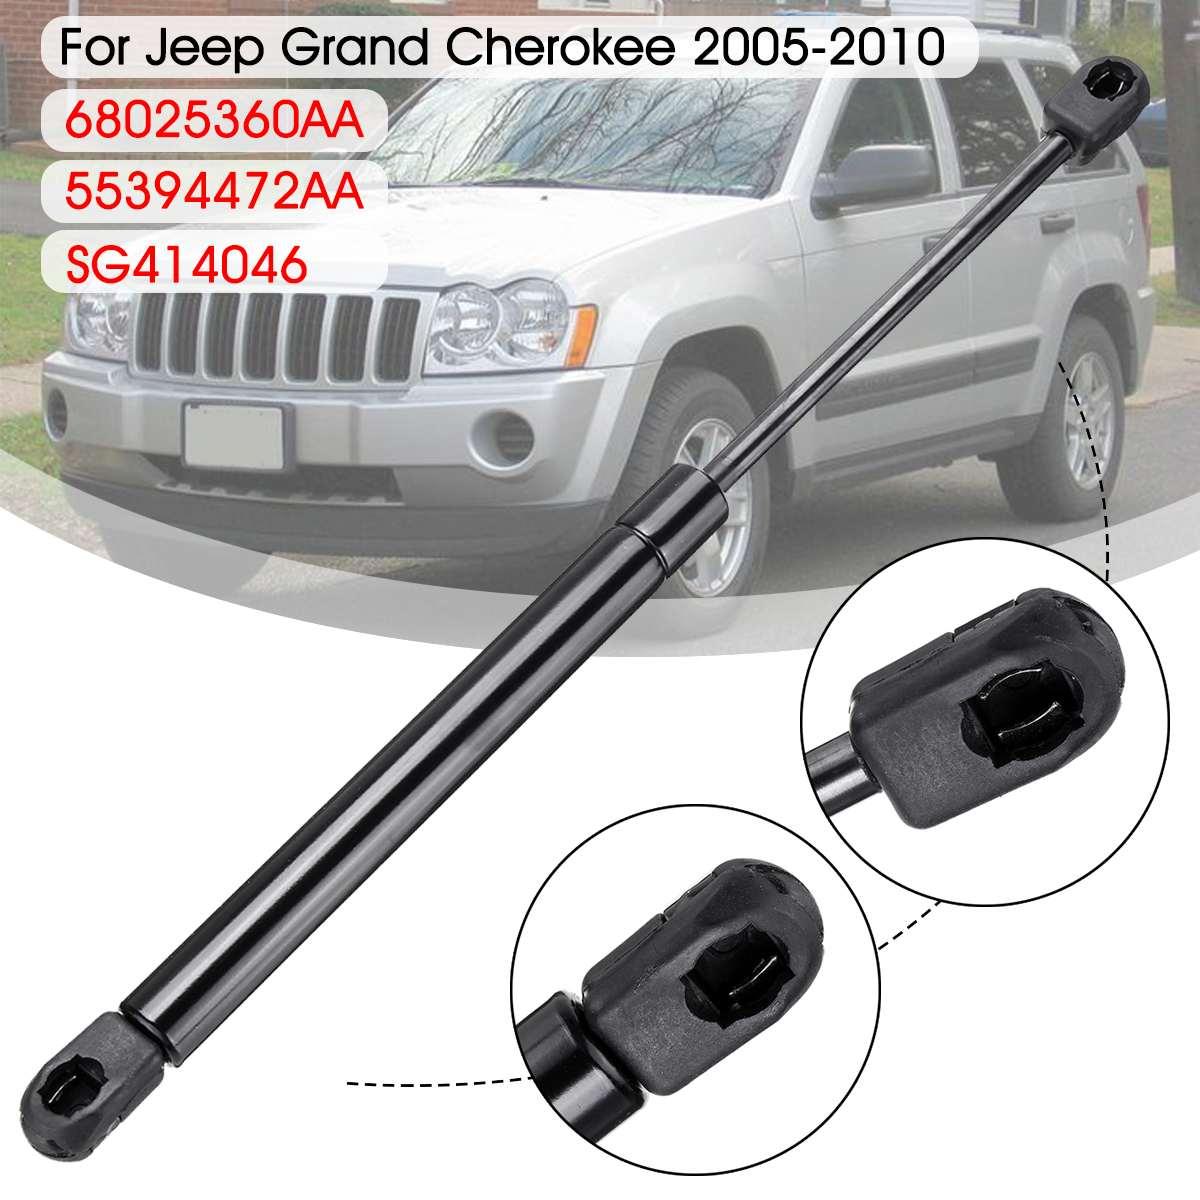 1x Hood Front Motorlift Shock Prop Arm Rod Domstreben for Jeep Grand Cherokee 2005 2006 2007 2008 2009 2010